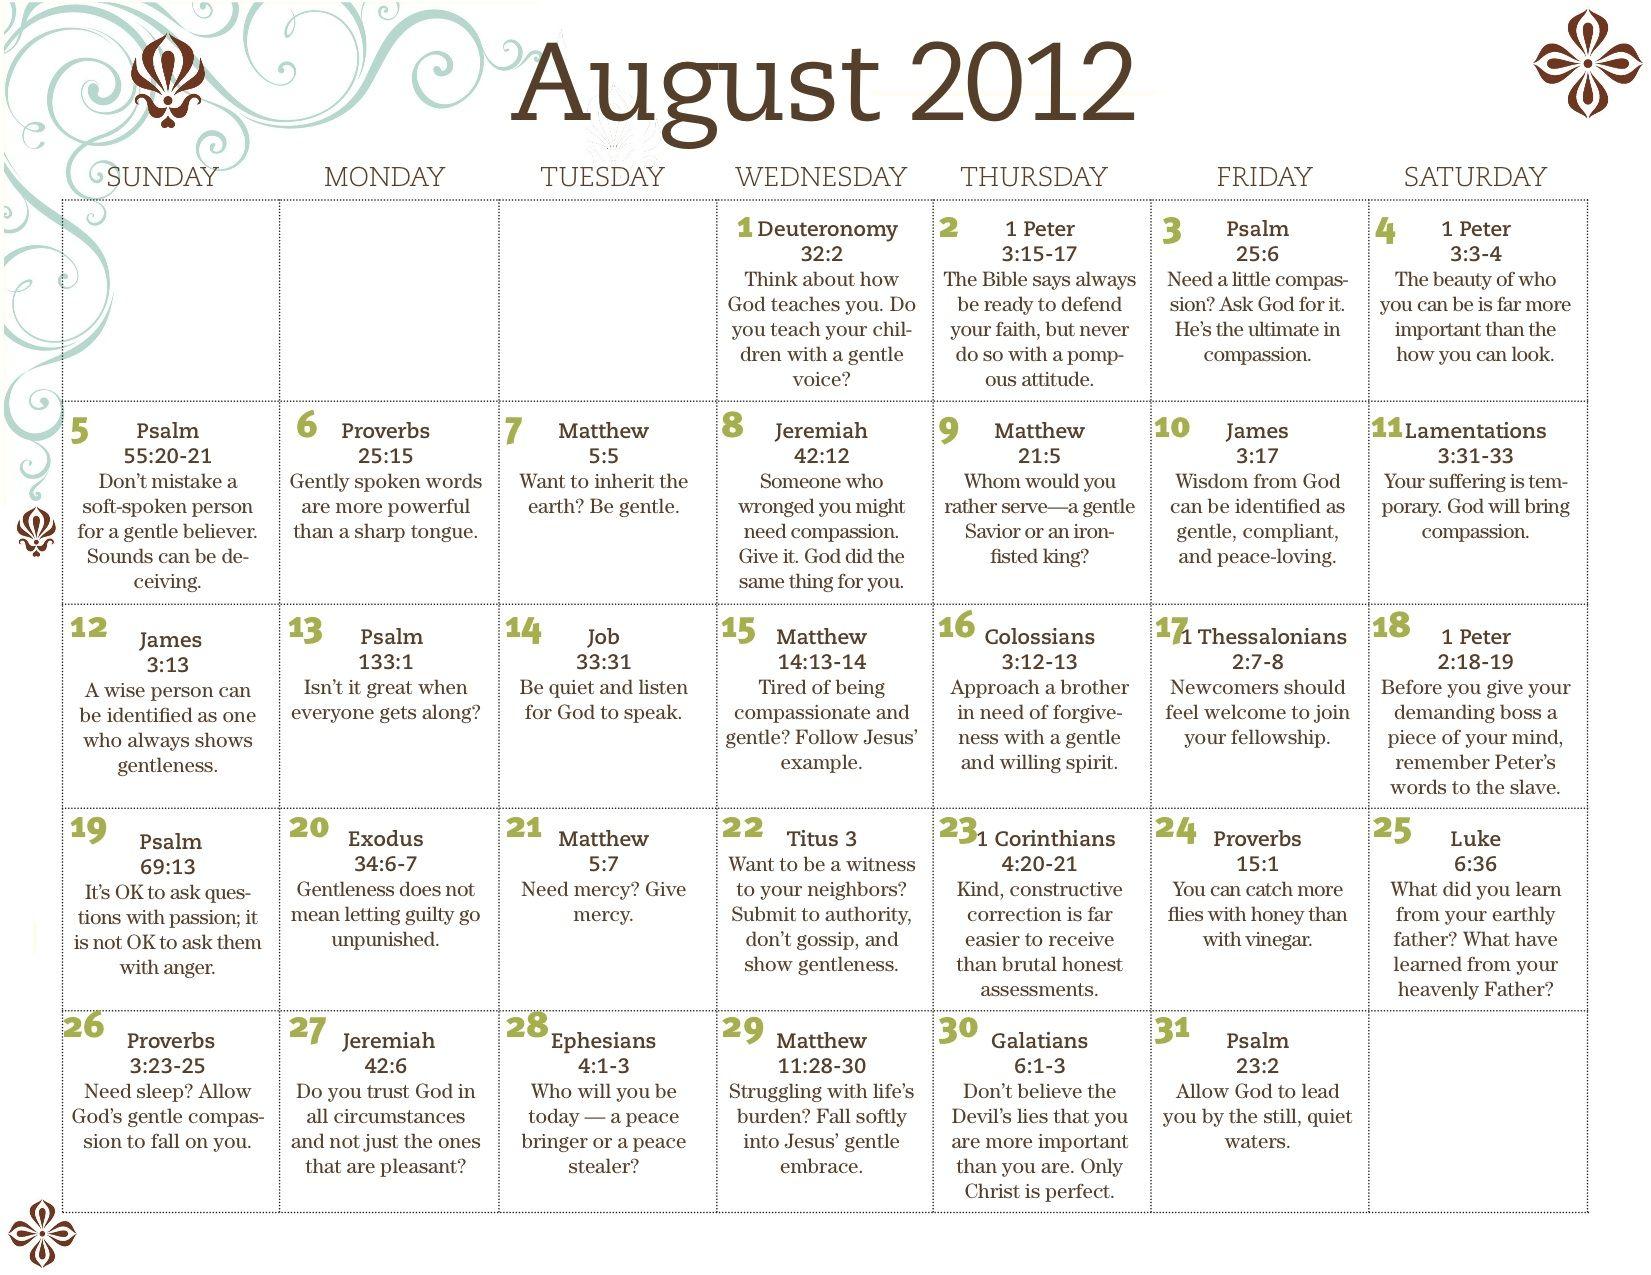 Our Daily Family Discipleship Calendar - August 2012 - HomeLife magazine